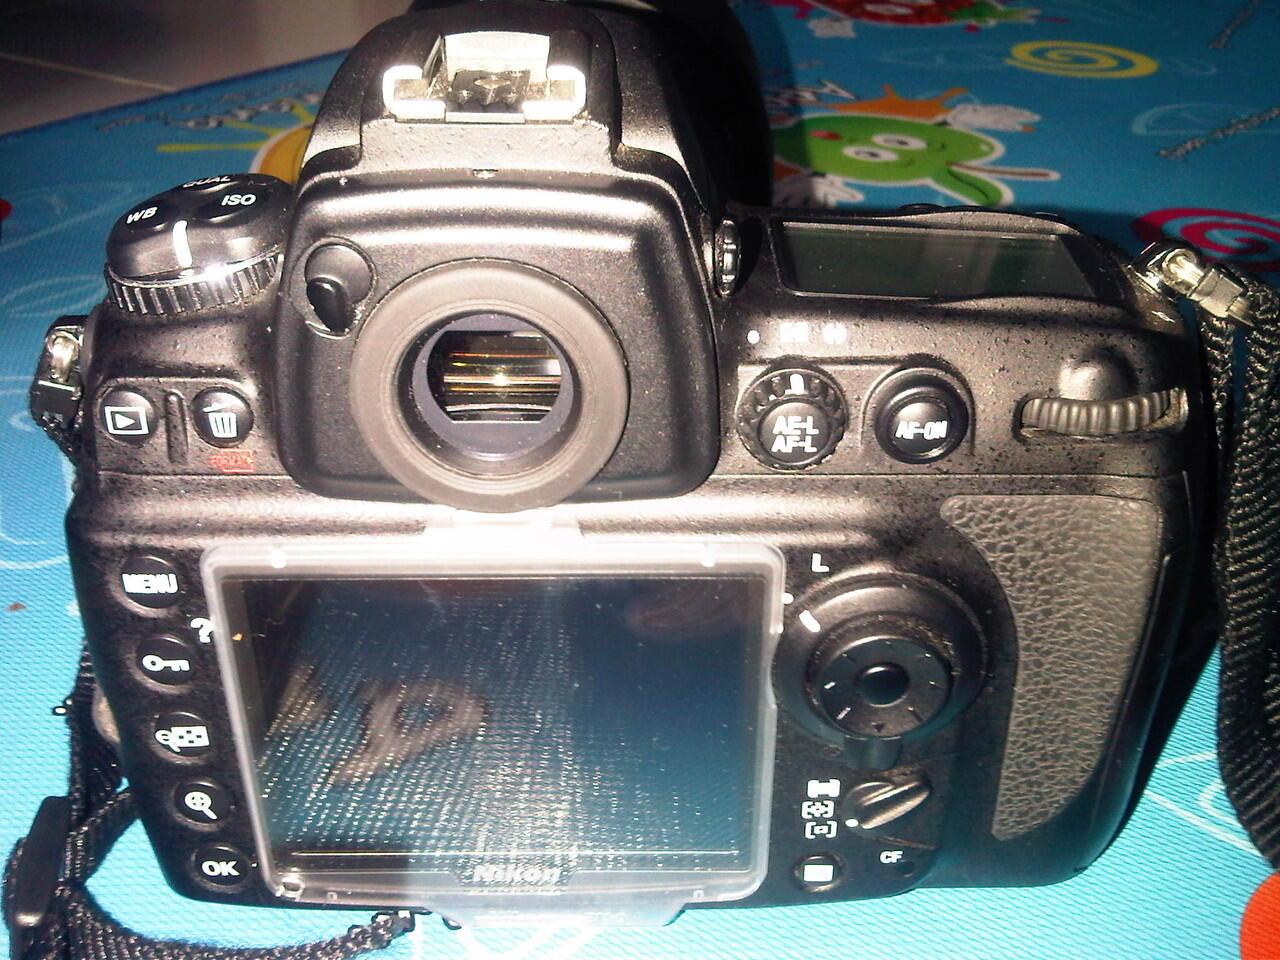 [wts] Nikon D700 + lensa AF 24-70 paling murah se Kaskus